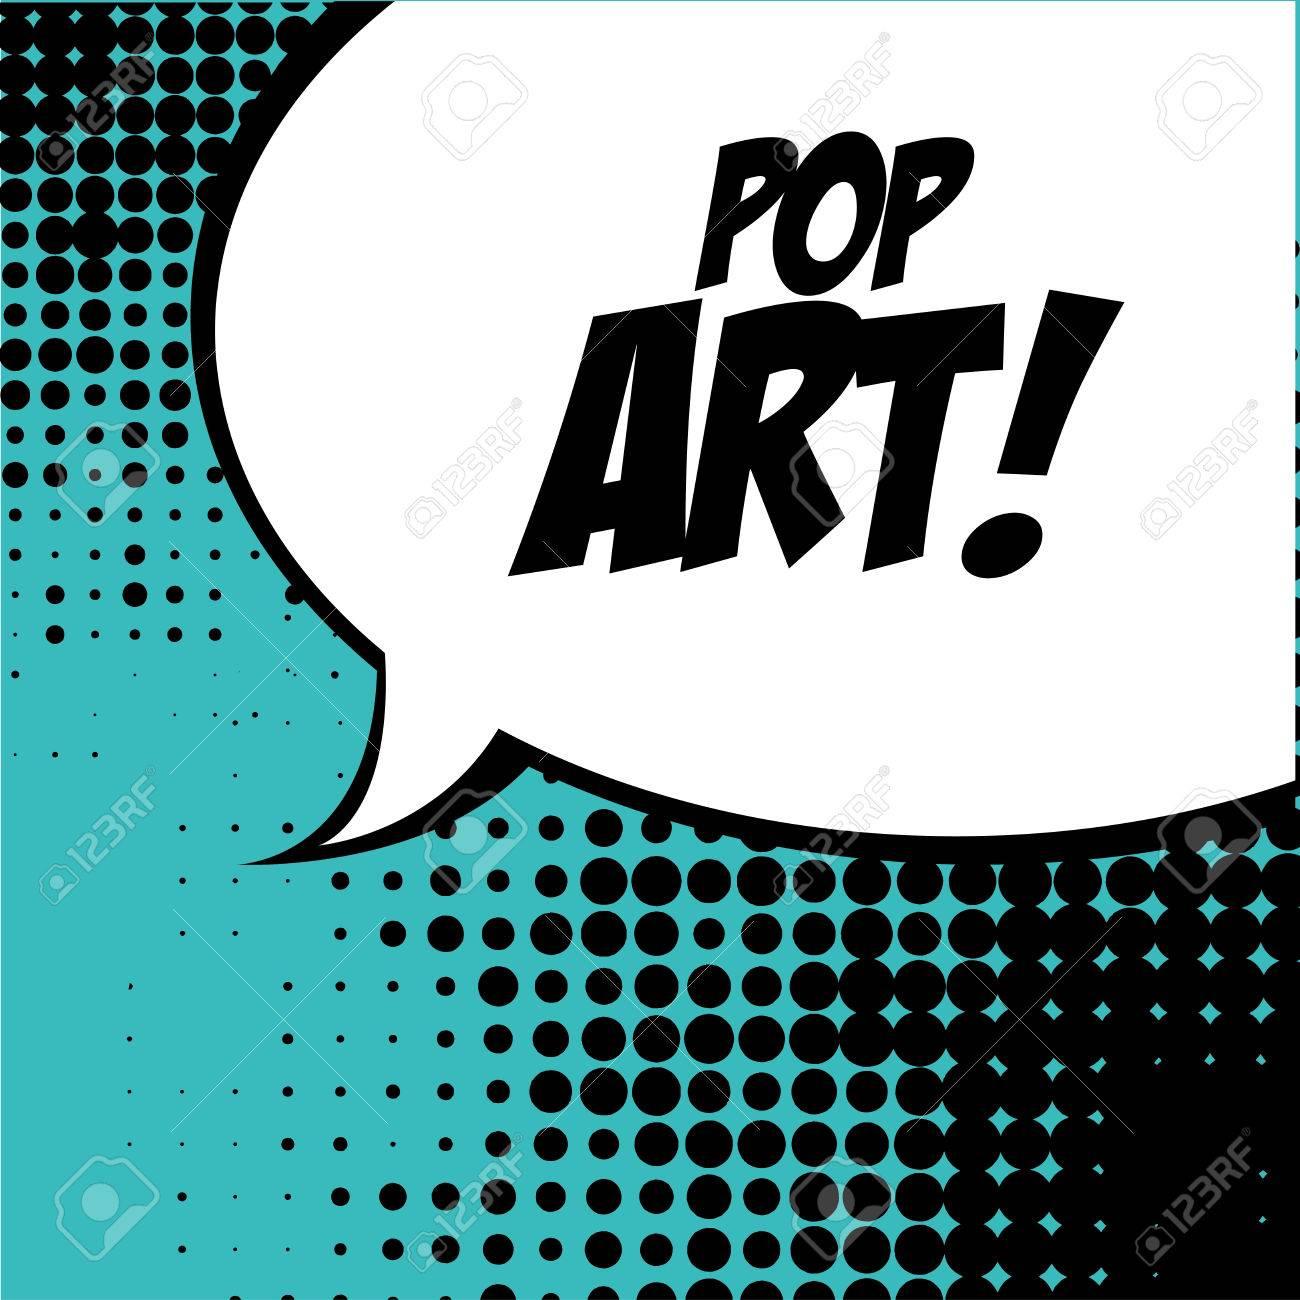 pop art   over   blue background vector illustration Stock Vector - 26379589